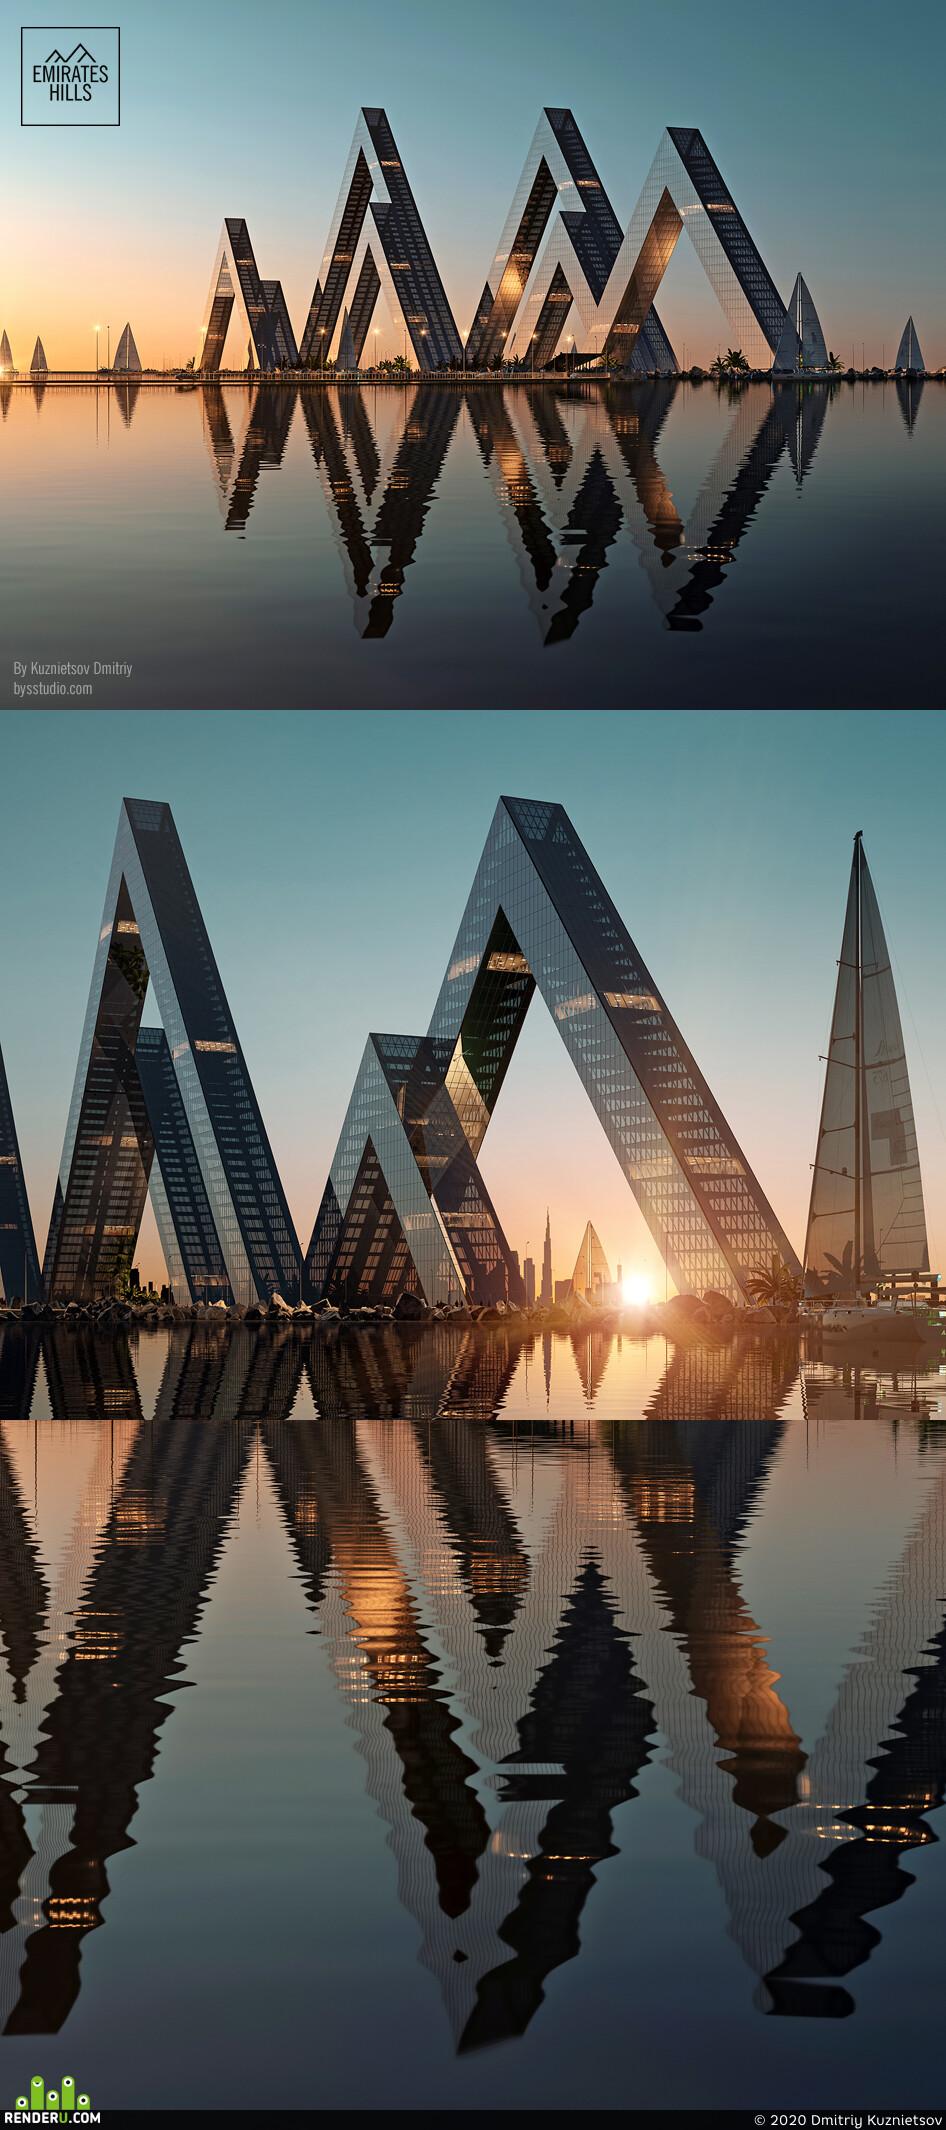 concept, art, hills, emirates, uae, modern house